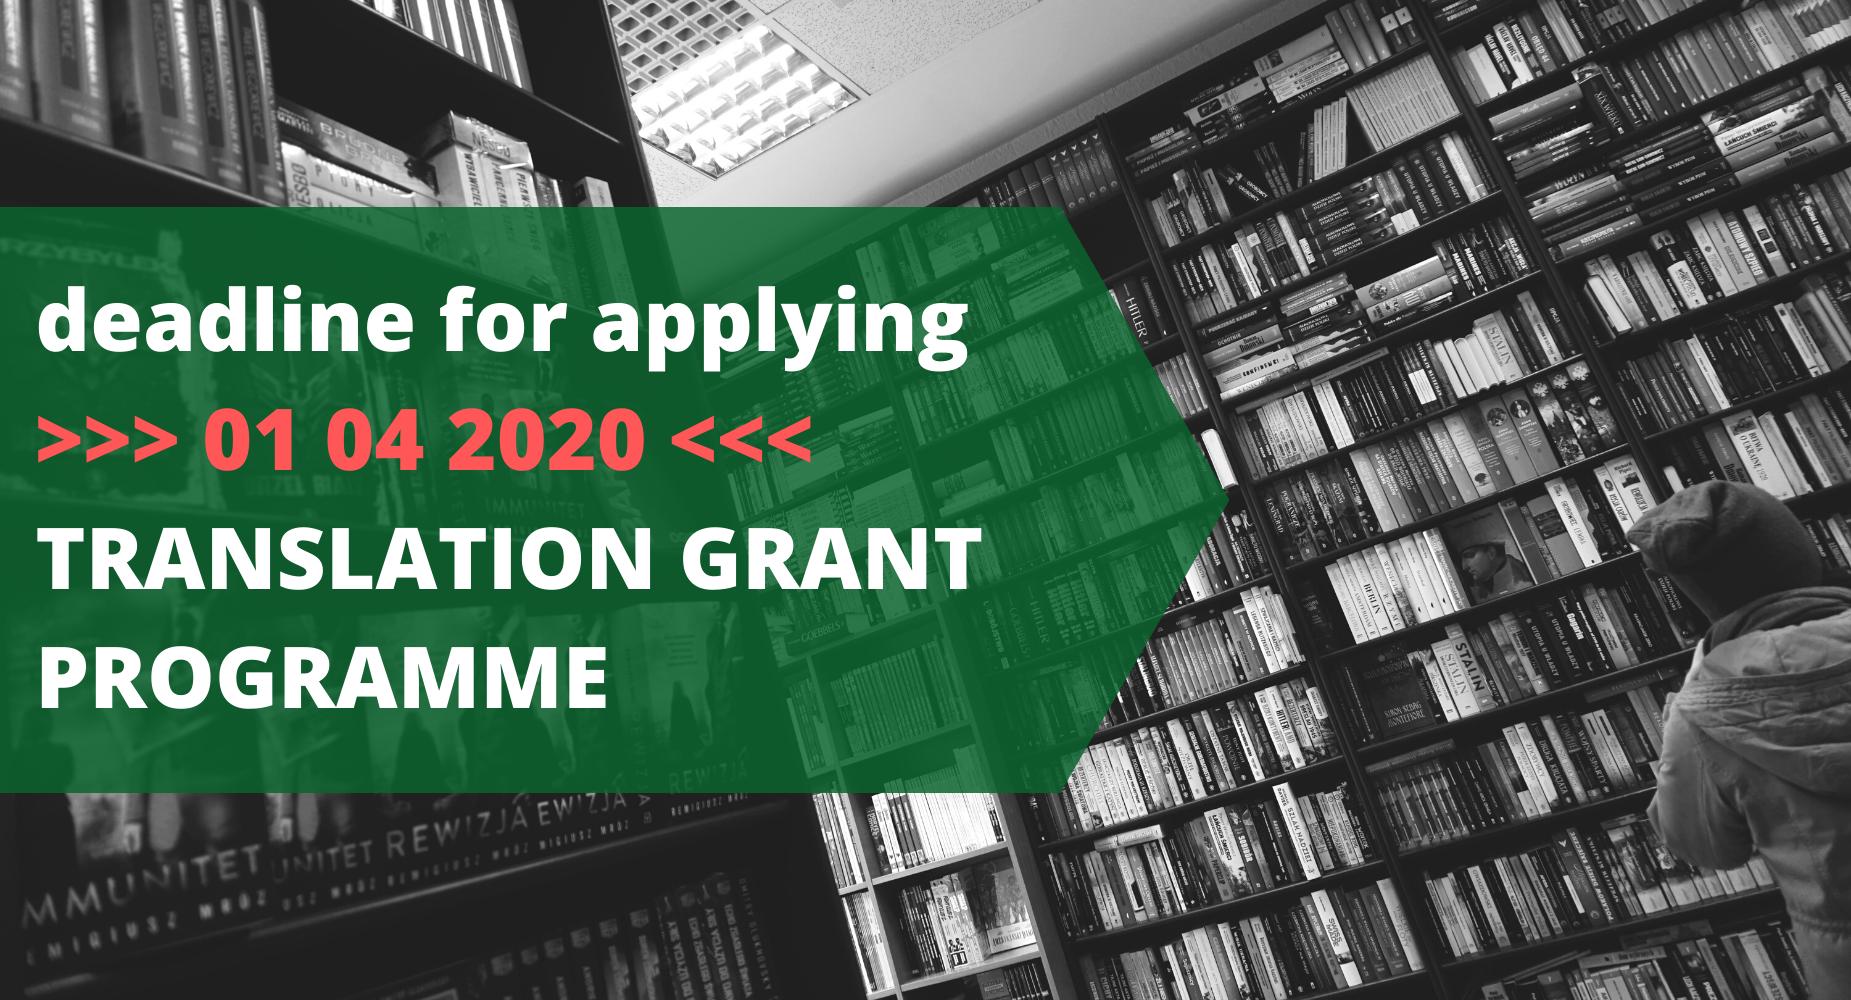 Translation Grant Programme